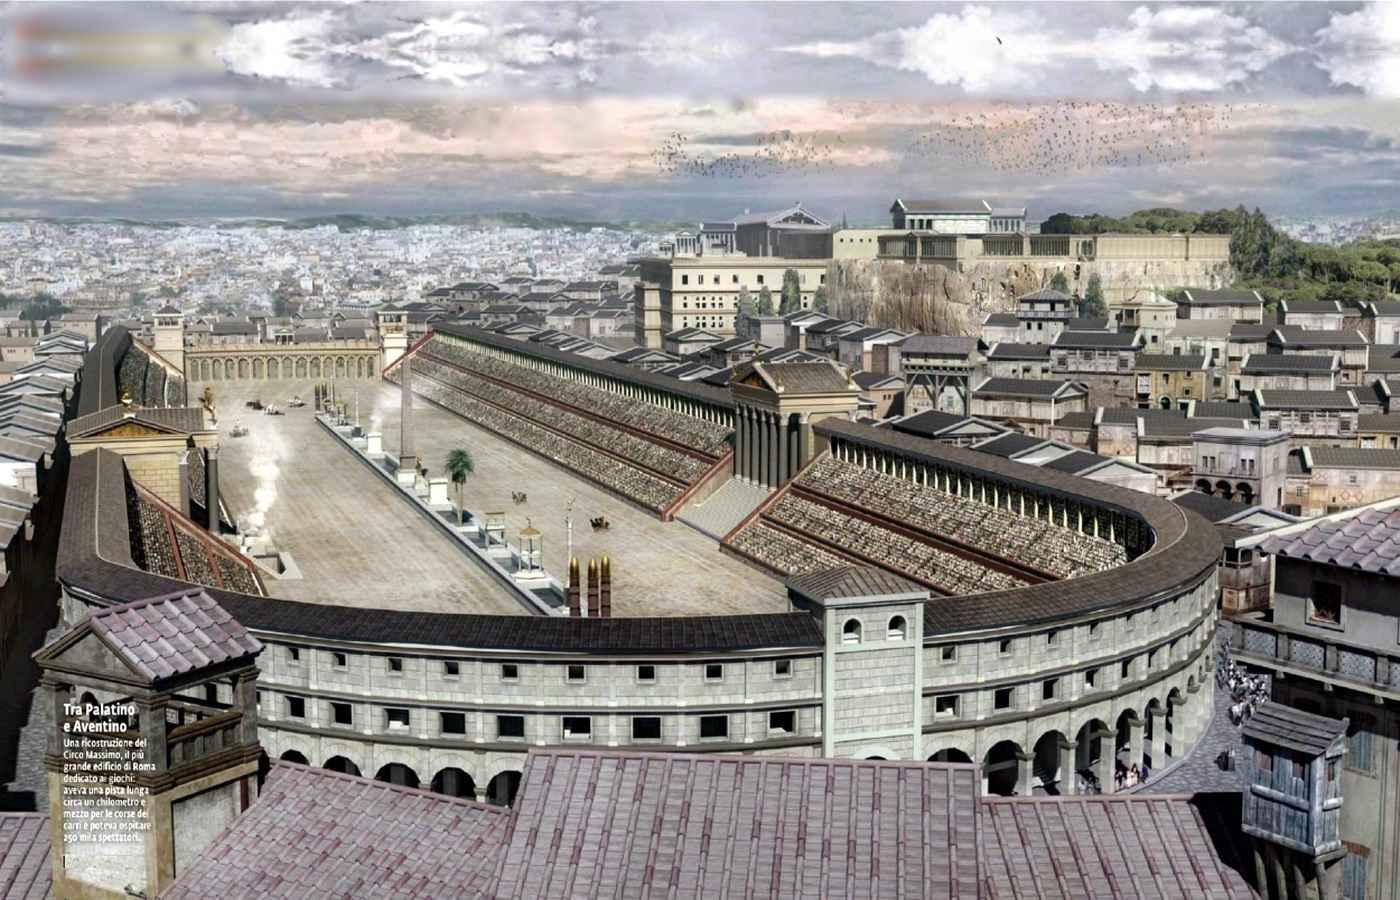 Circus Maximus - THEN